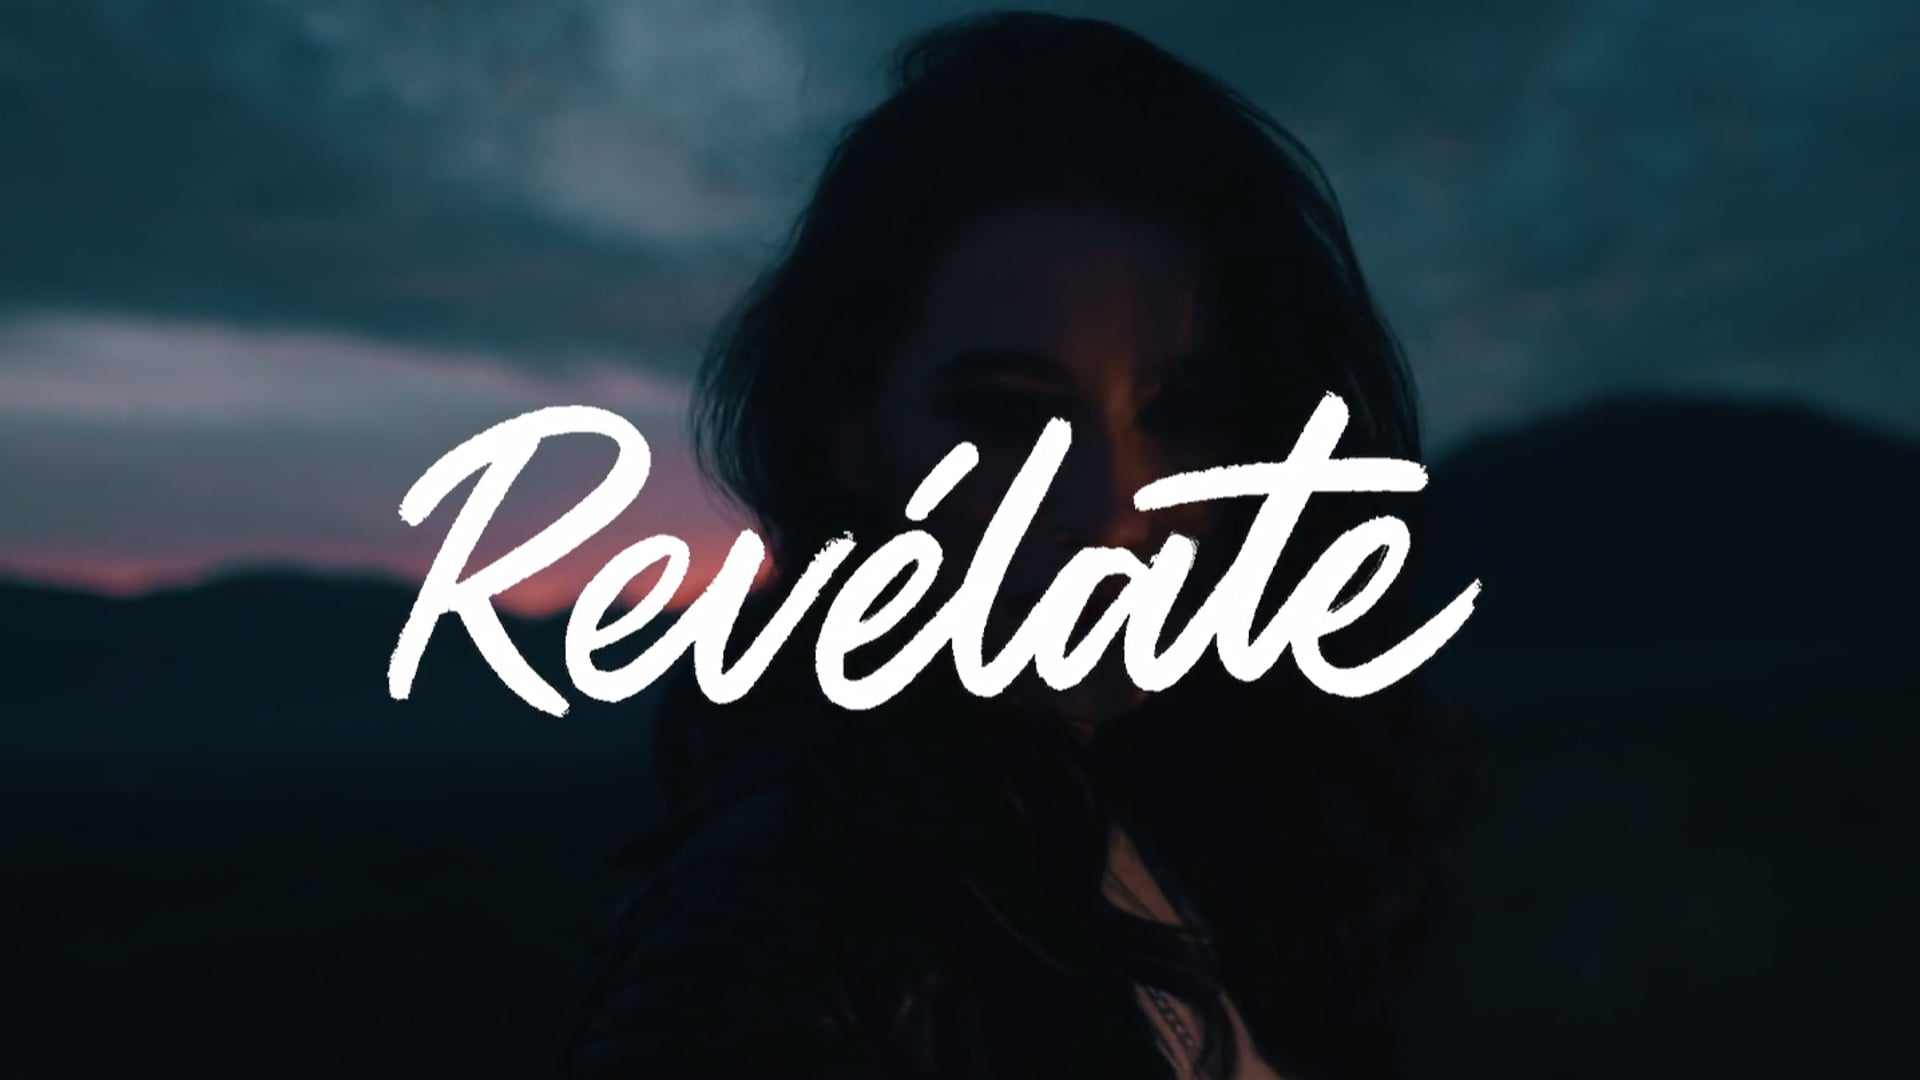 Mary Kay — Revélate